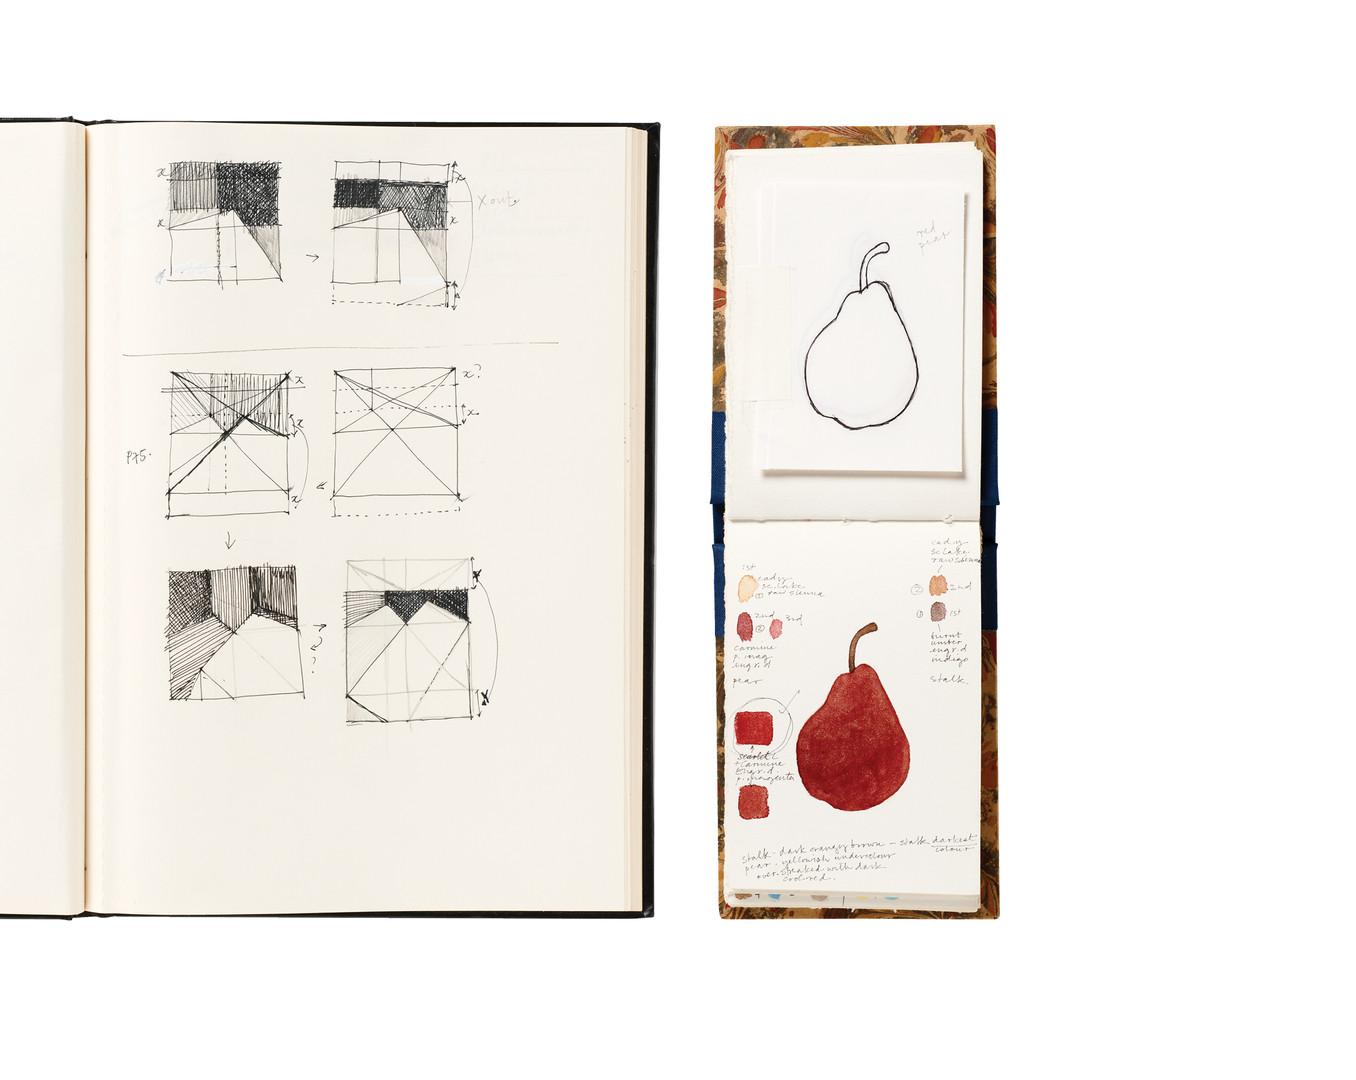 MM Retrospective Catalogue 40.jpg